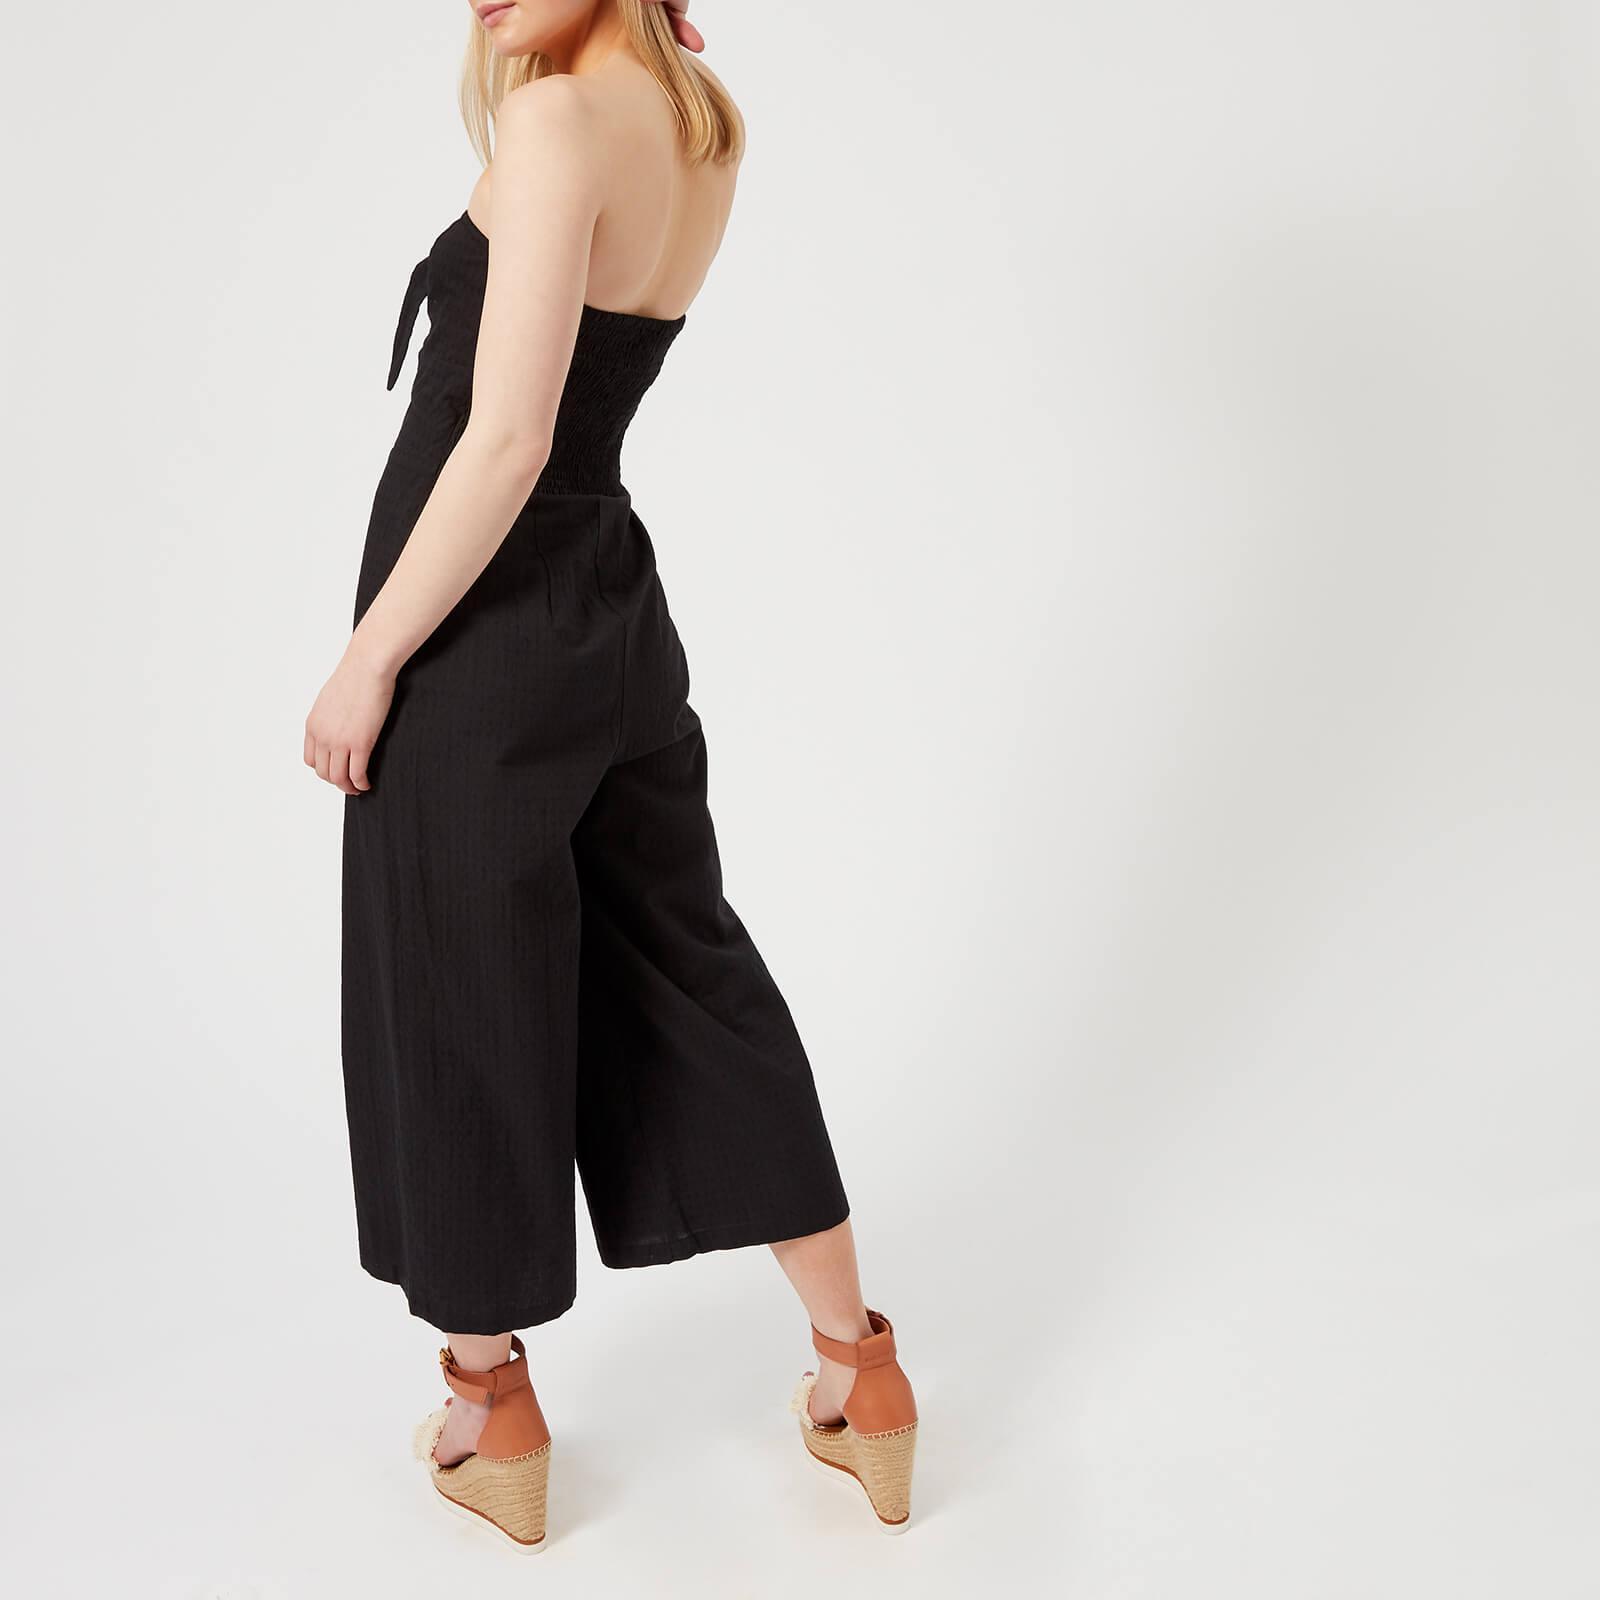 2a649a7aa136 MINKPINK - Black Say It Right Strapless Jumpsuit - Lyst. View fullscreen